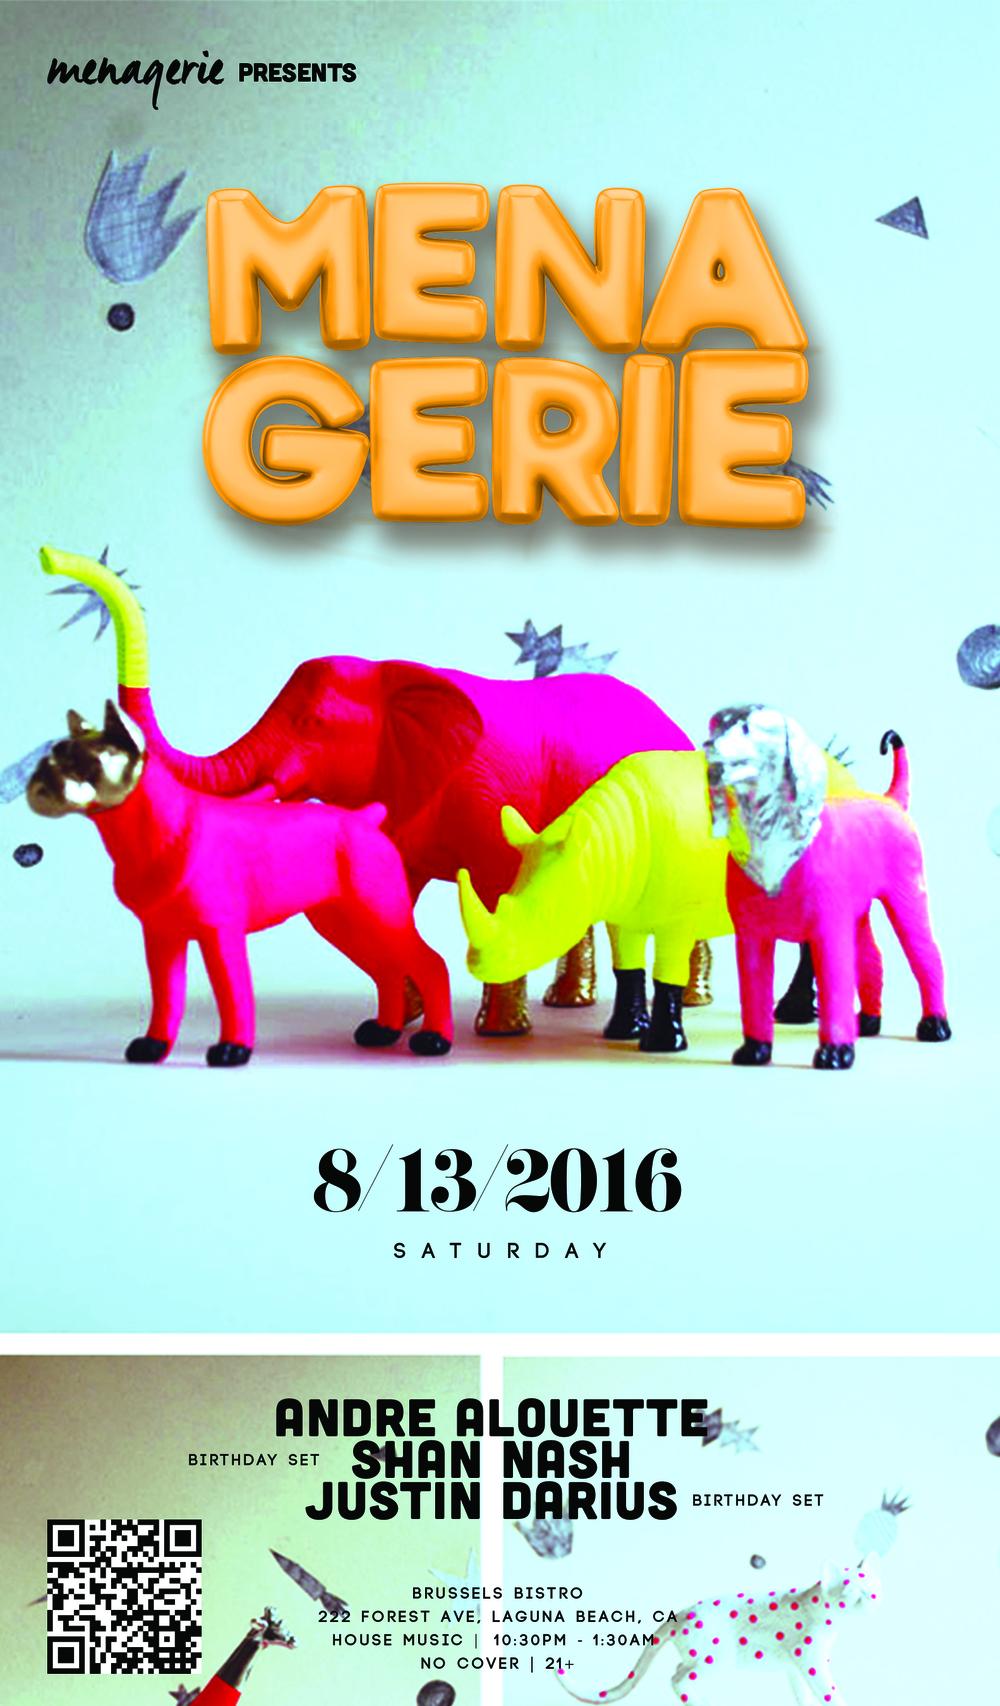 8-13-2016 Brussels print size v2.jpg